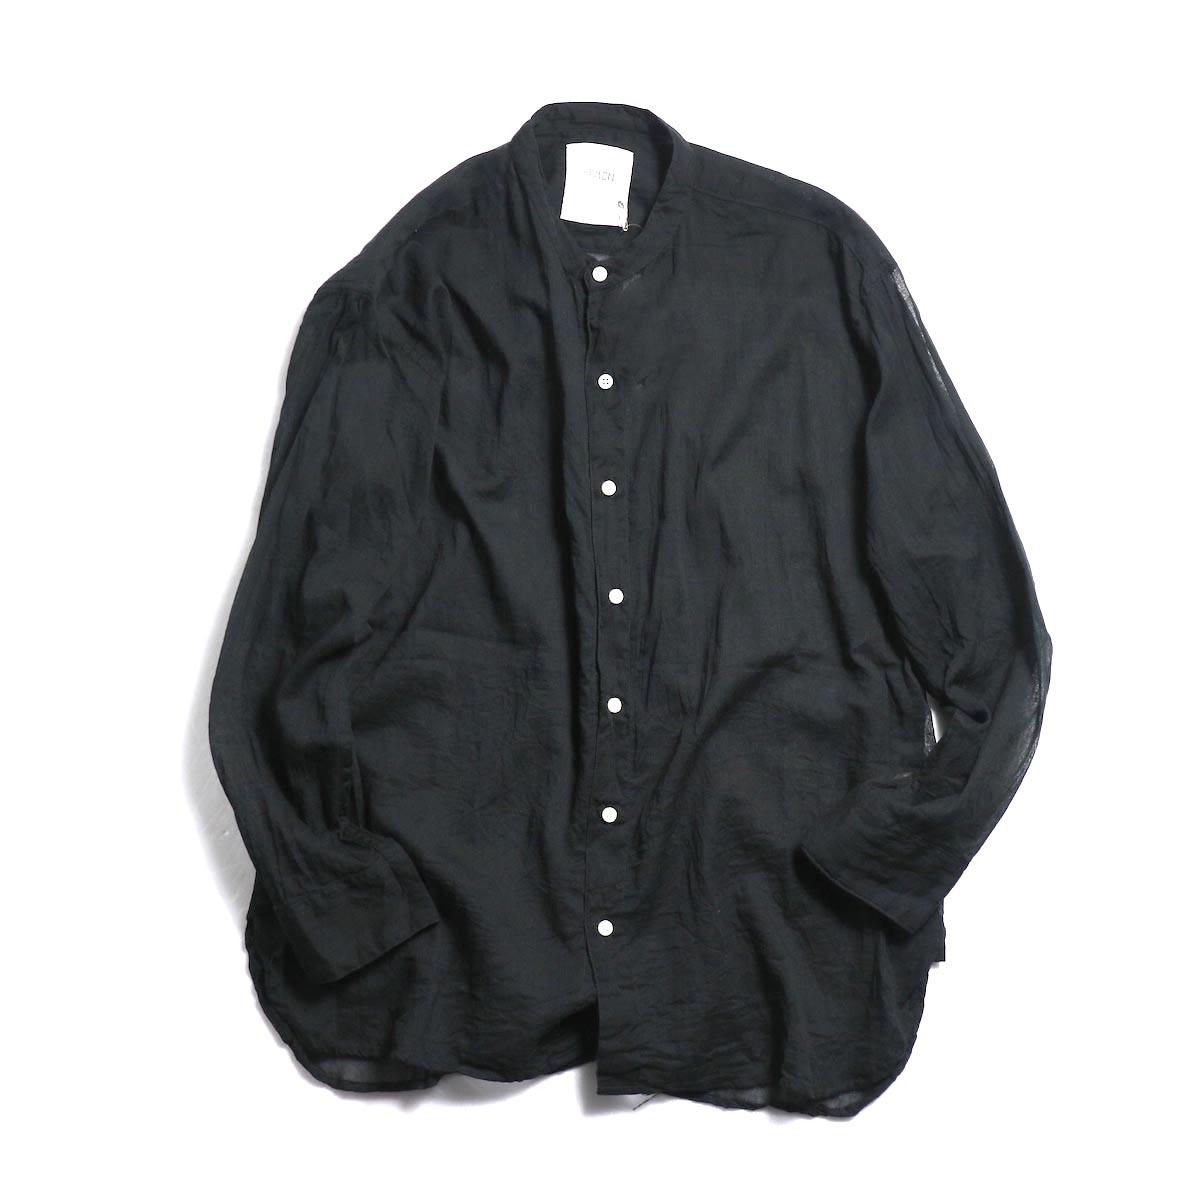 ARMEN / Utility Banded Collar Shirt -Black